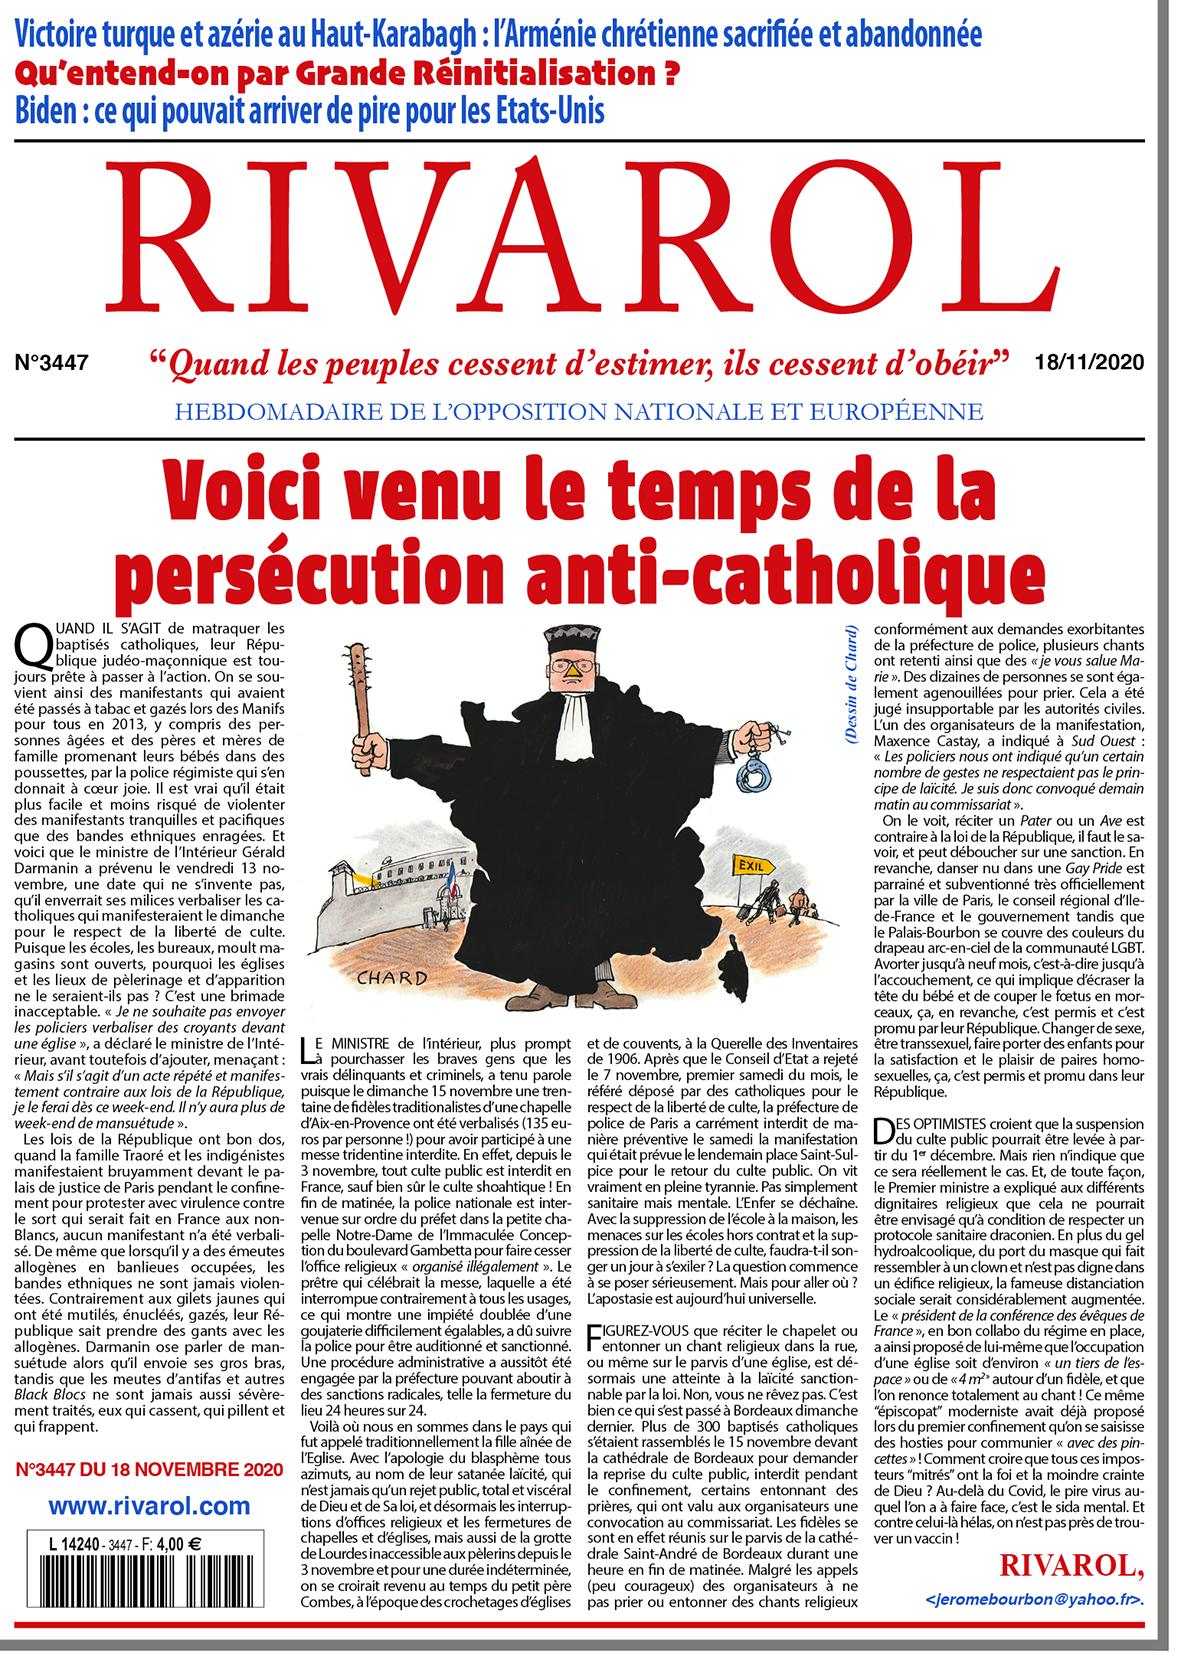 Rivarol n°3447 du18/11/2020